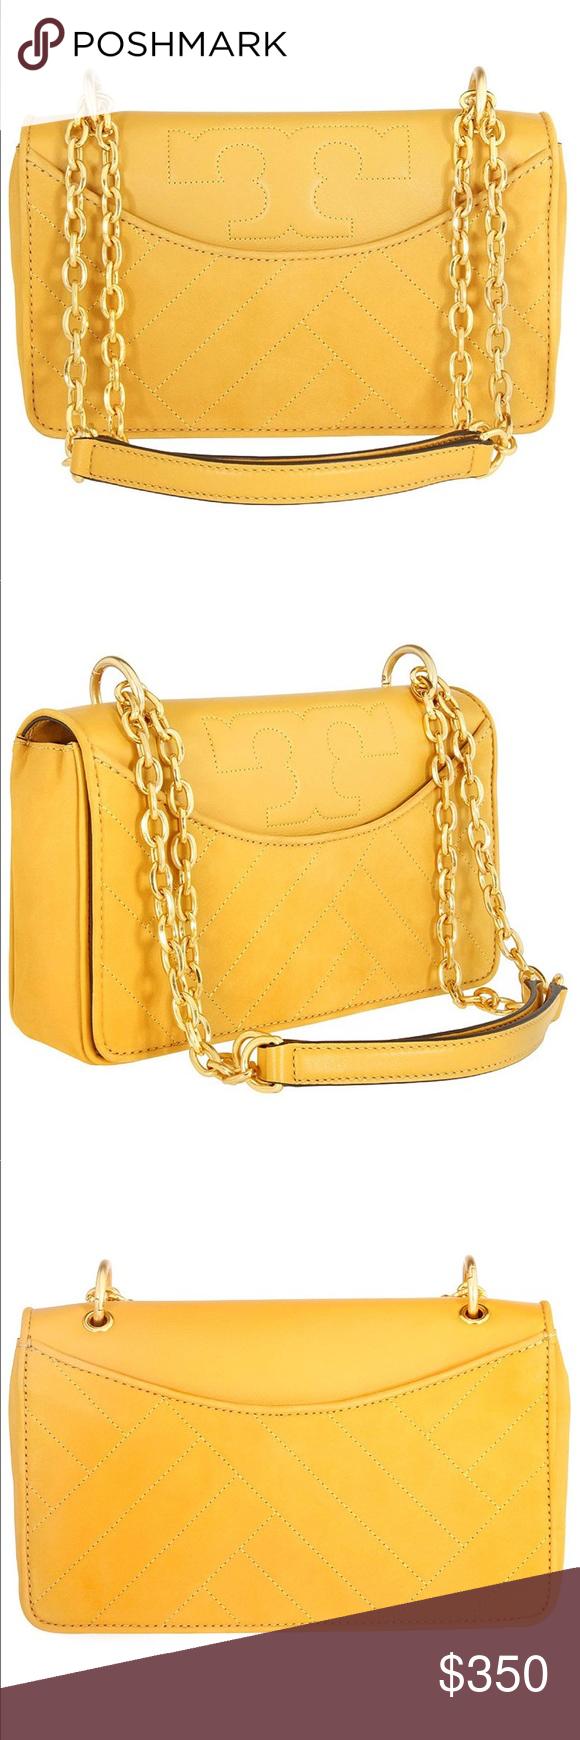 1f9f8ed08d Tory Burch Leather Shoulder Bag Description Tory Burch Alexa Ladies Medium  Leather Shoulder Bag 41487721.